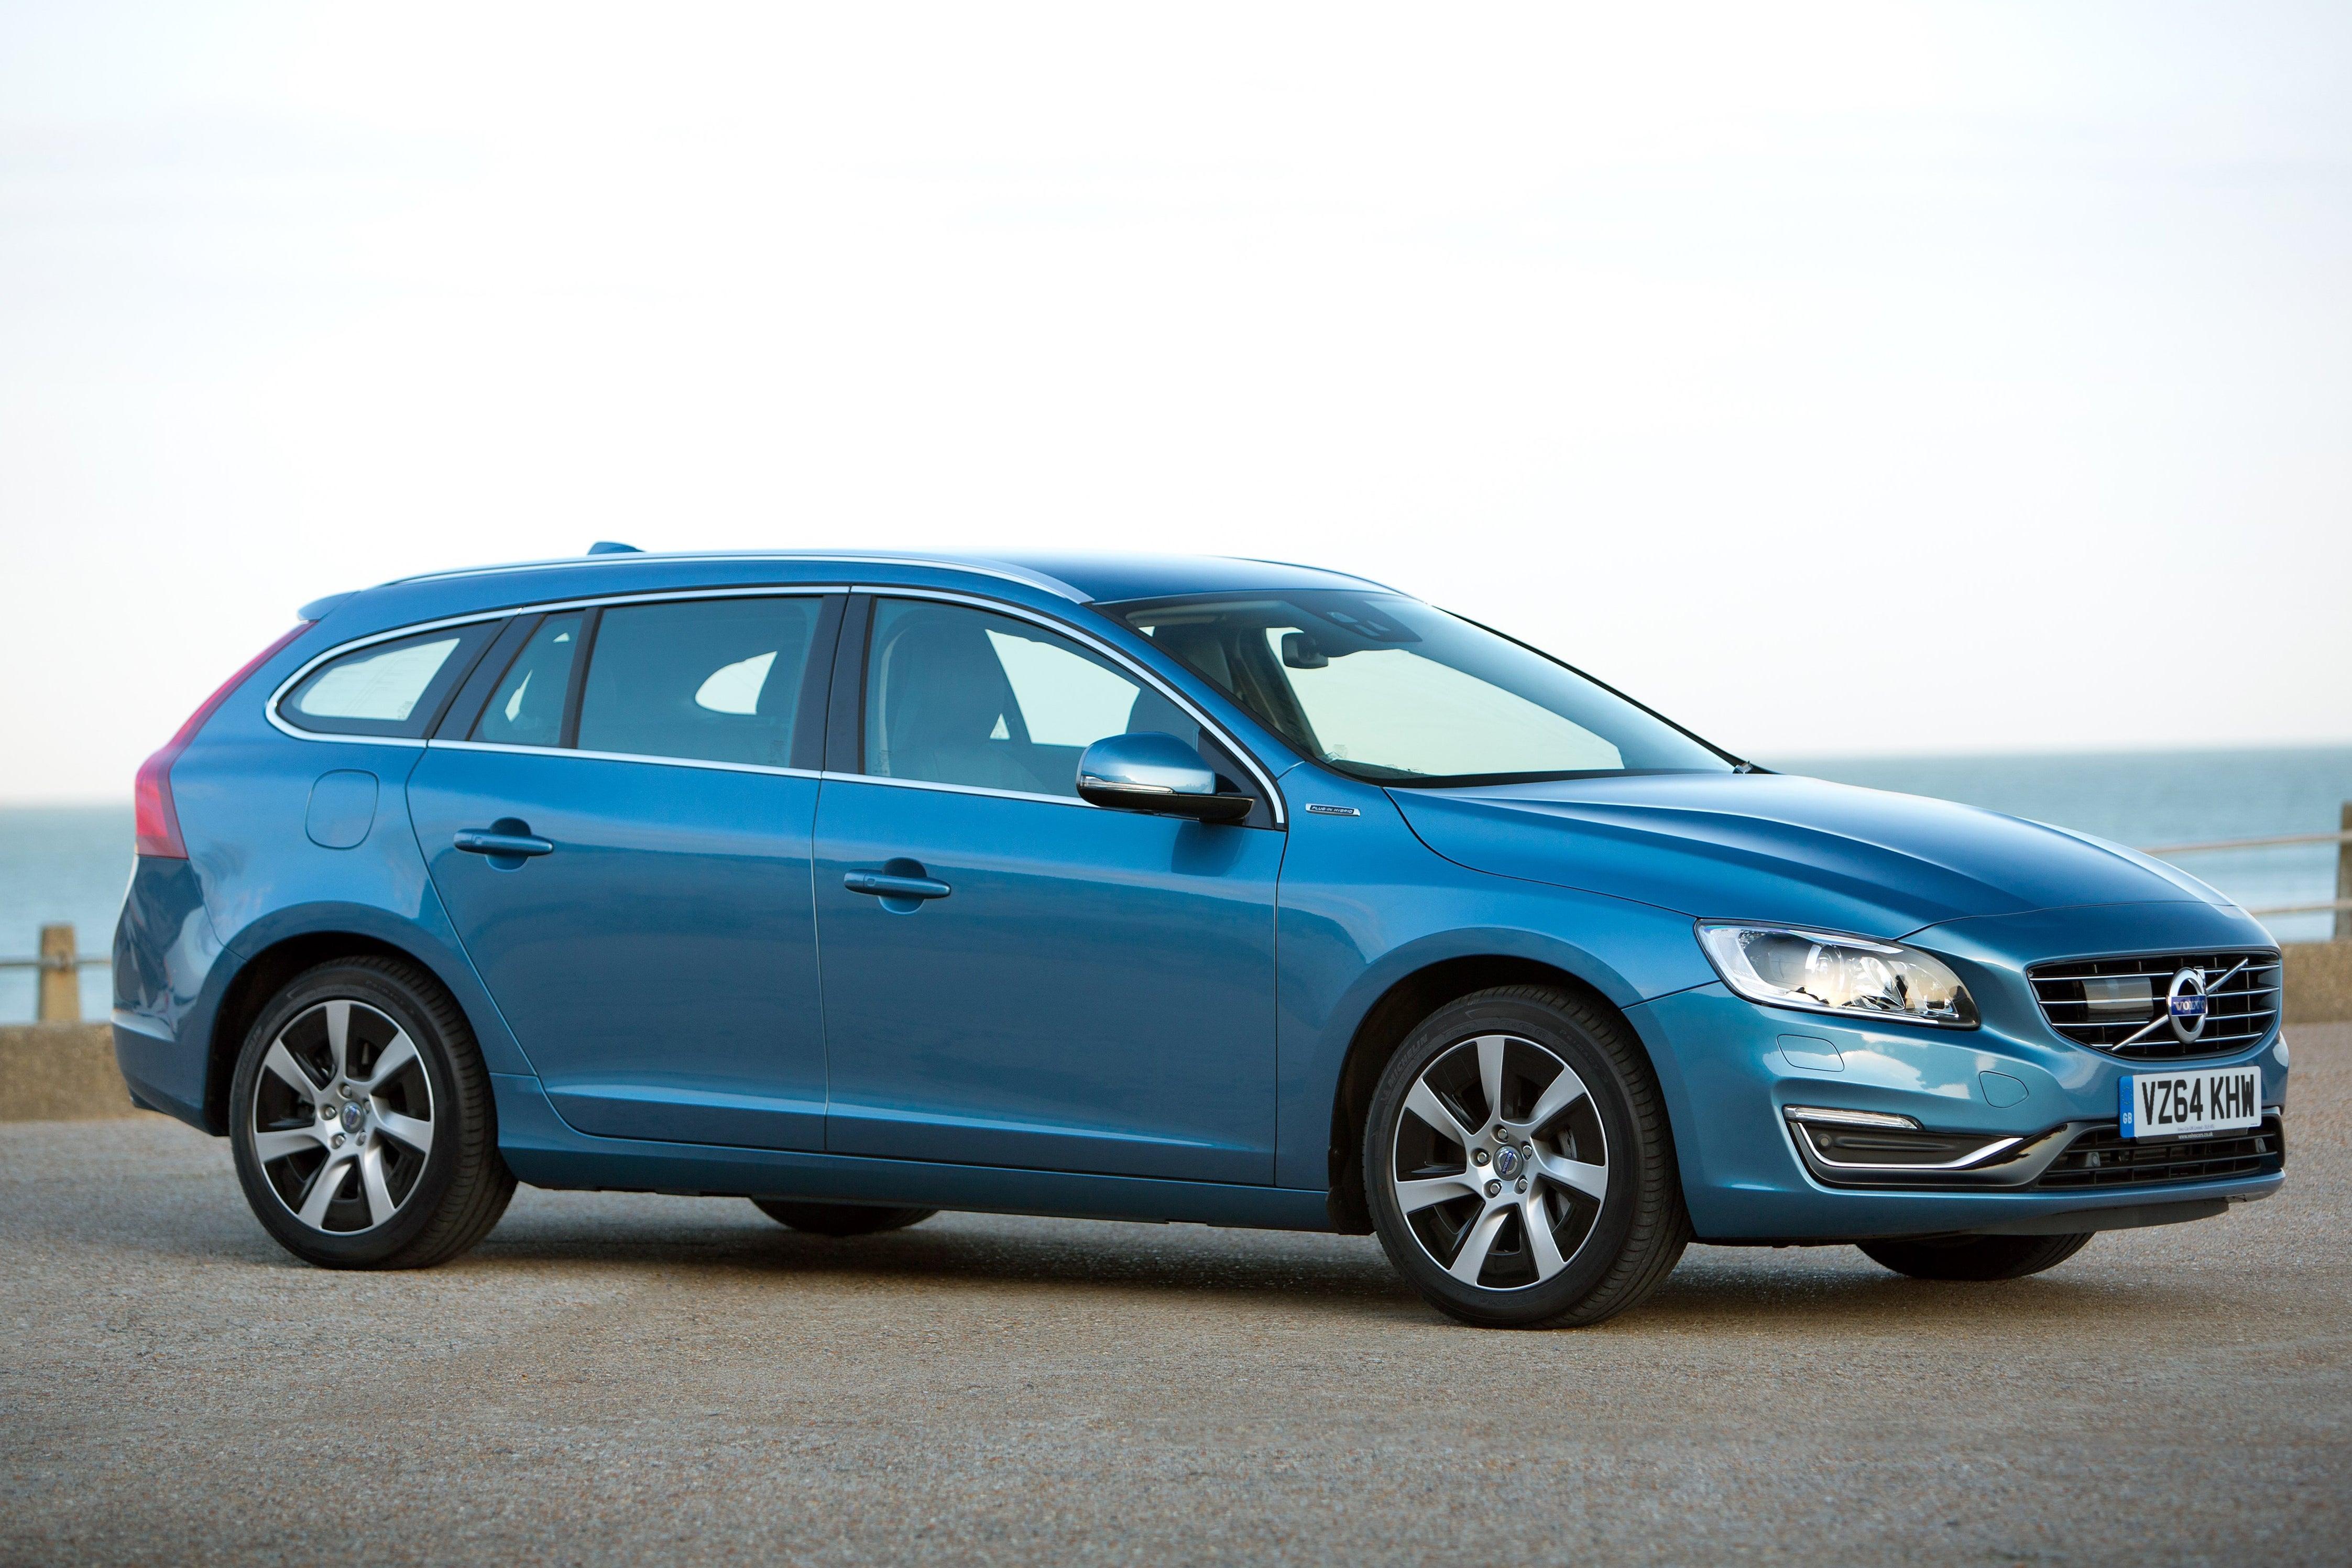 Volvo V60 Right Side View